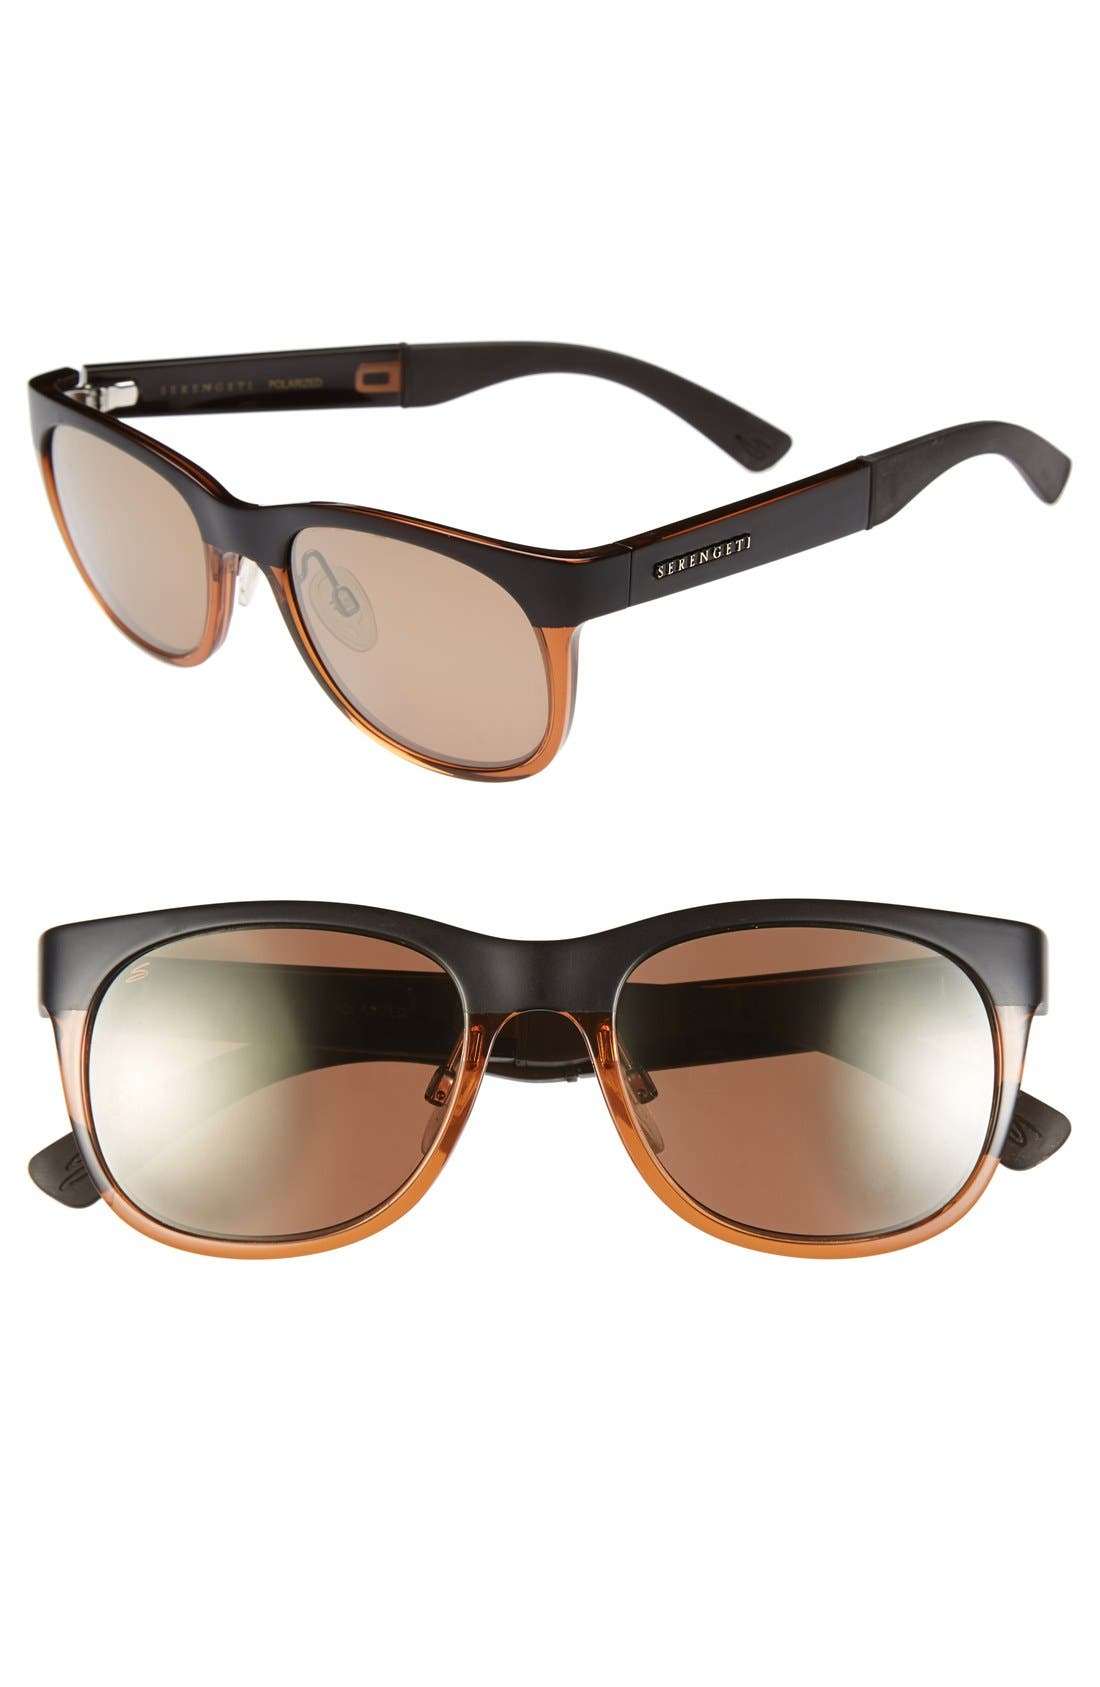 Main Image - Serengeti 'Milano' 50mm Polarized Sunglasses